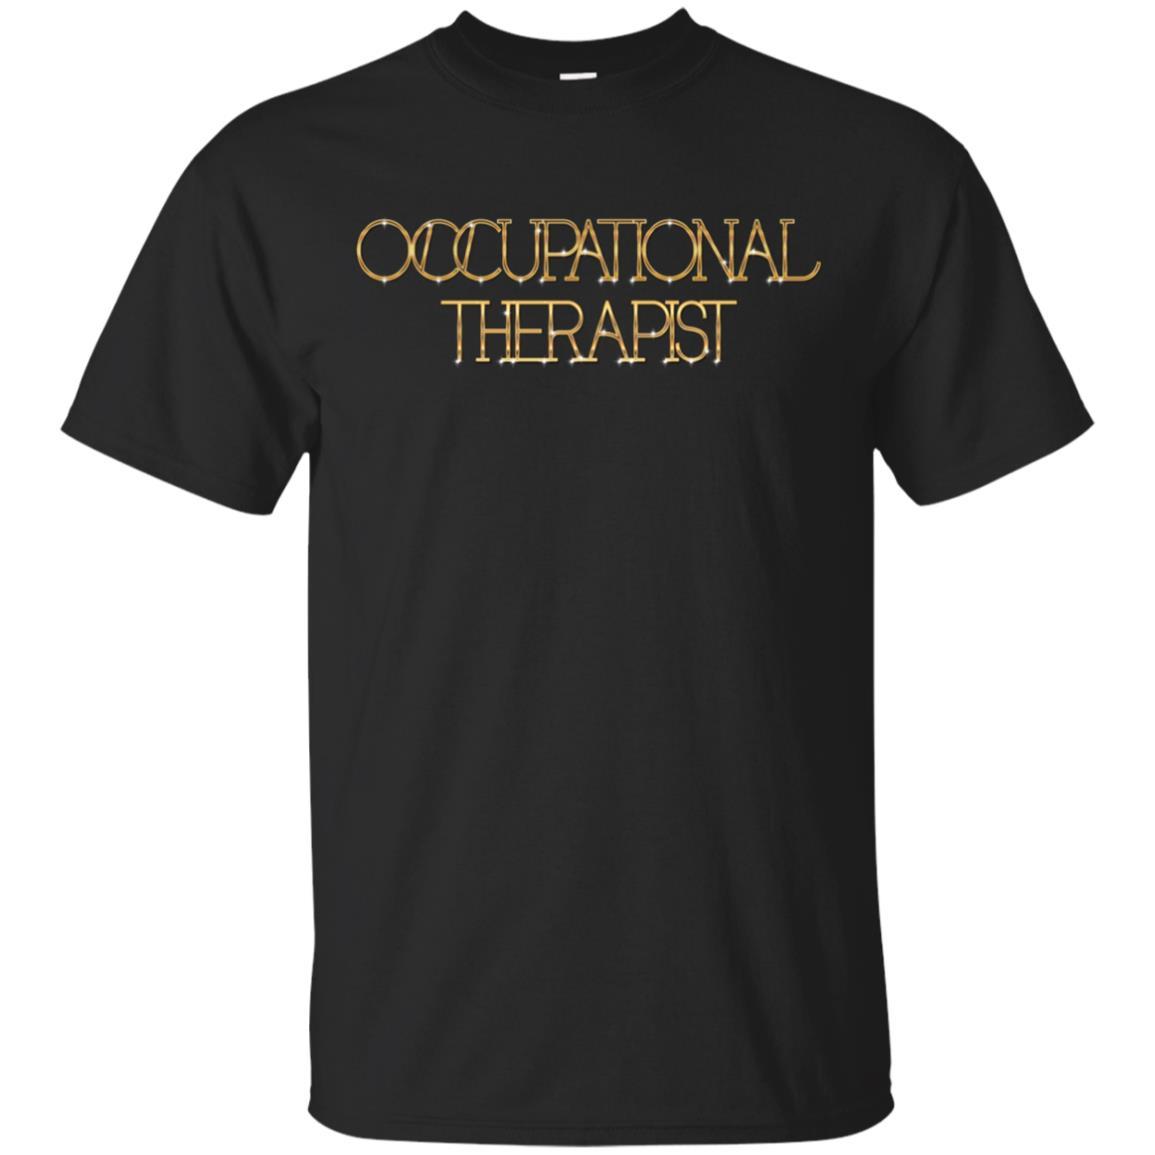 Occupational therapist job Unisex Short Sleeve